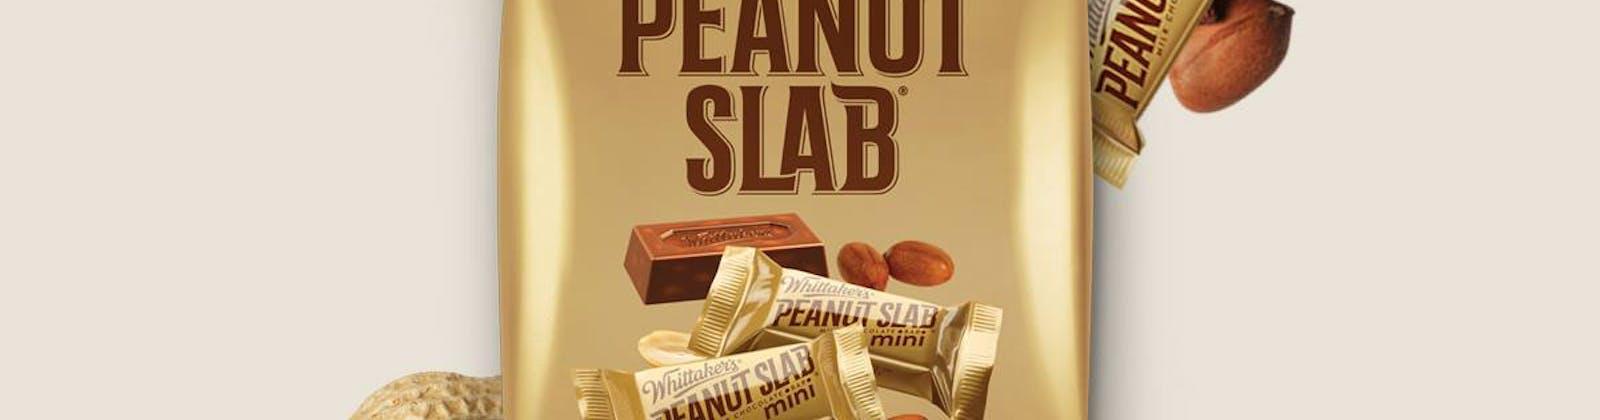 Whitaker's Peanut Slab